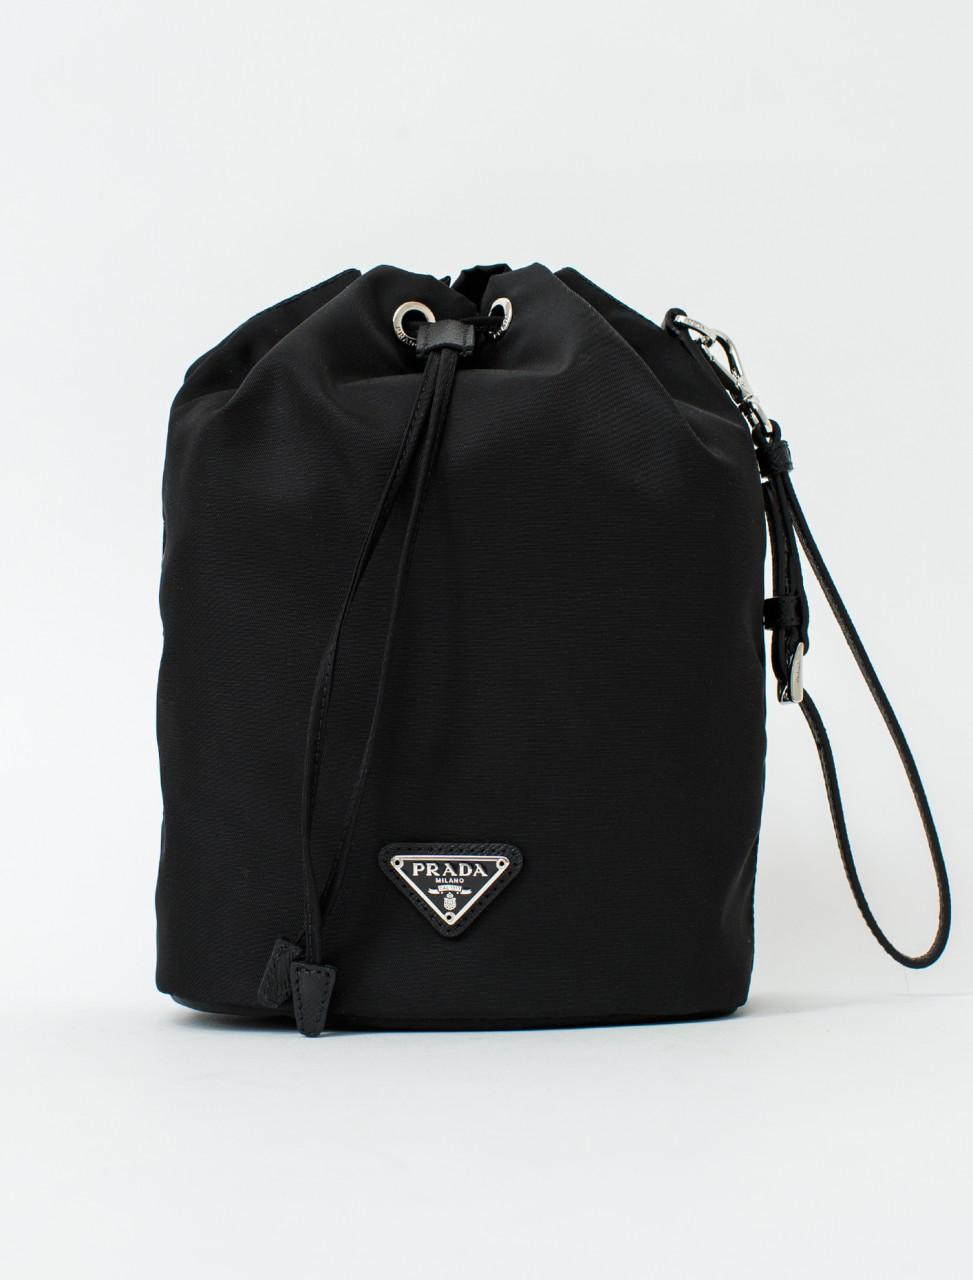 Prada Sailcloth Drawstring Bag